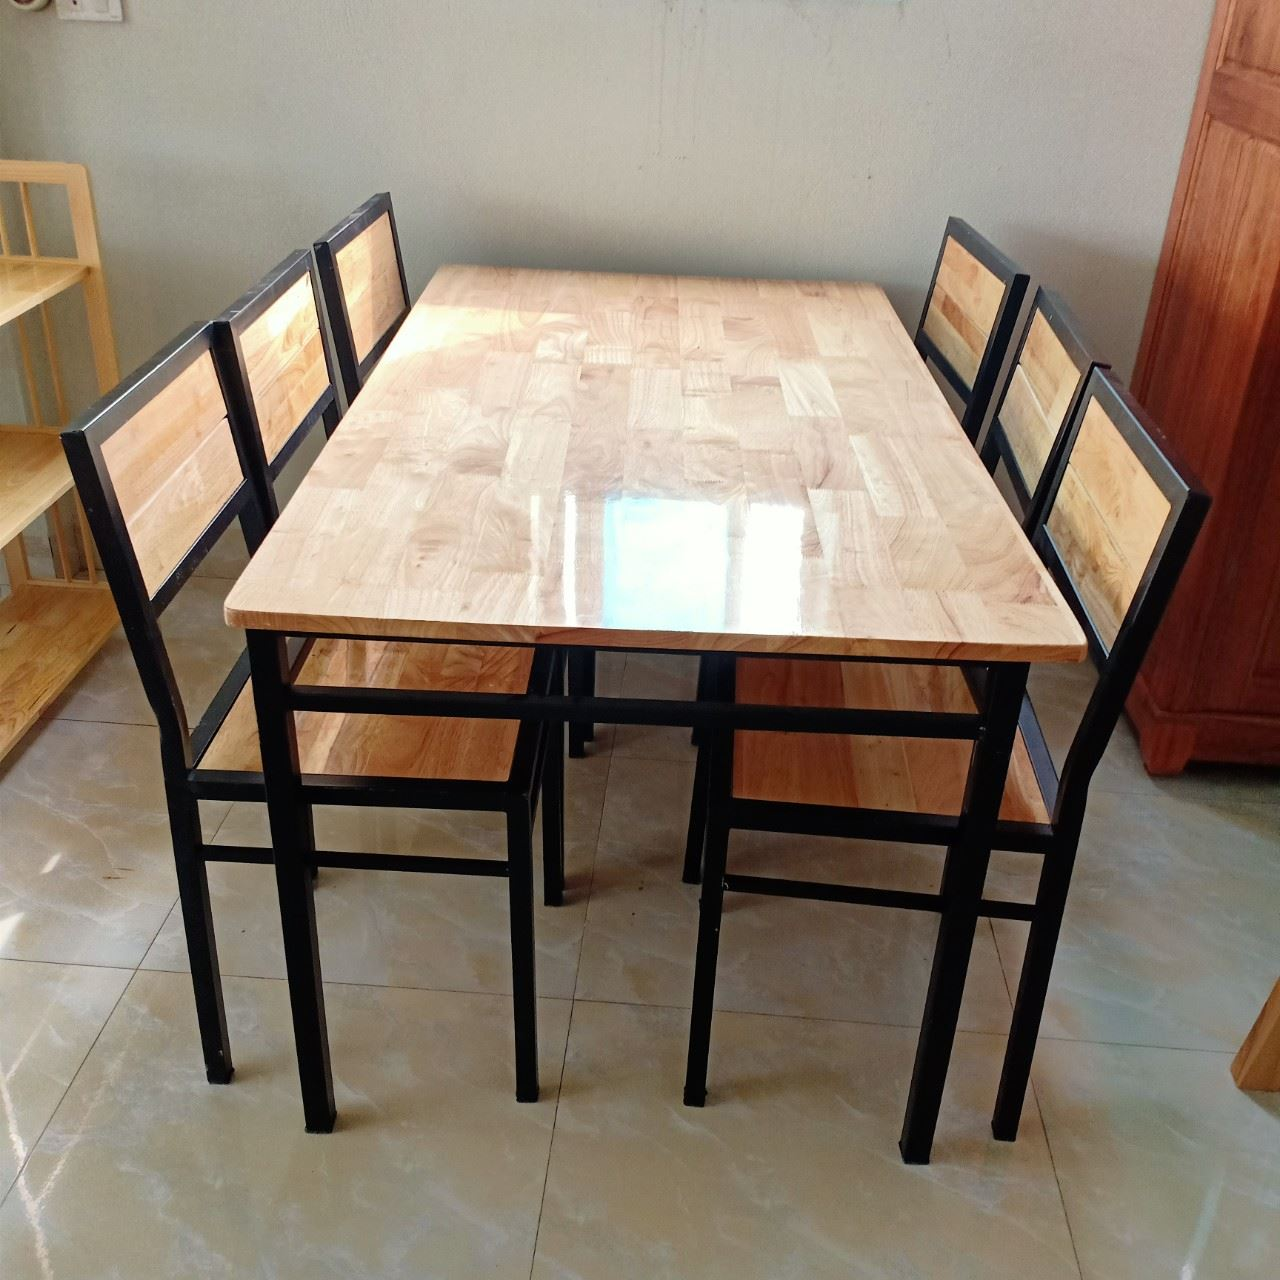 Bàn ghế chân sắt mặt gỗ 6 ghế, mới 100%